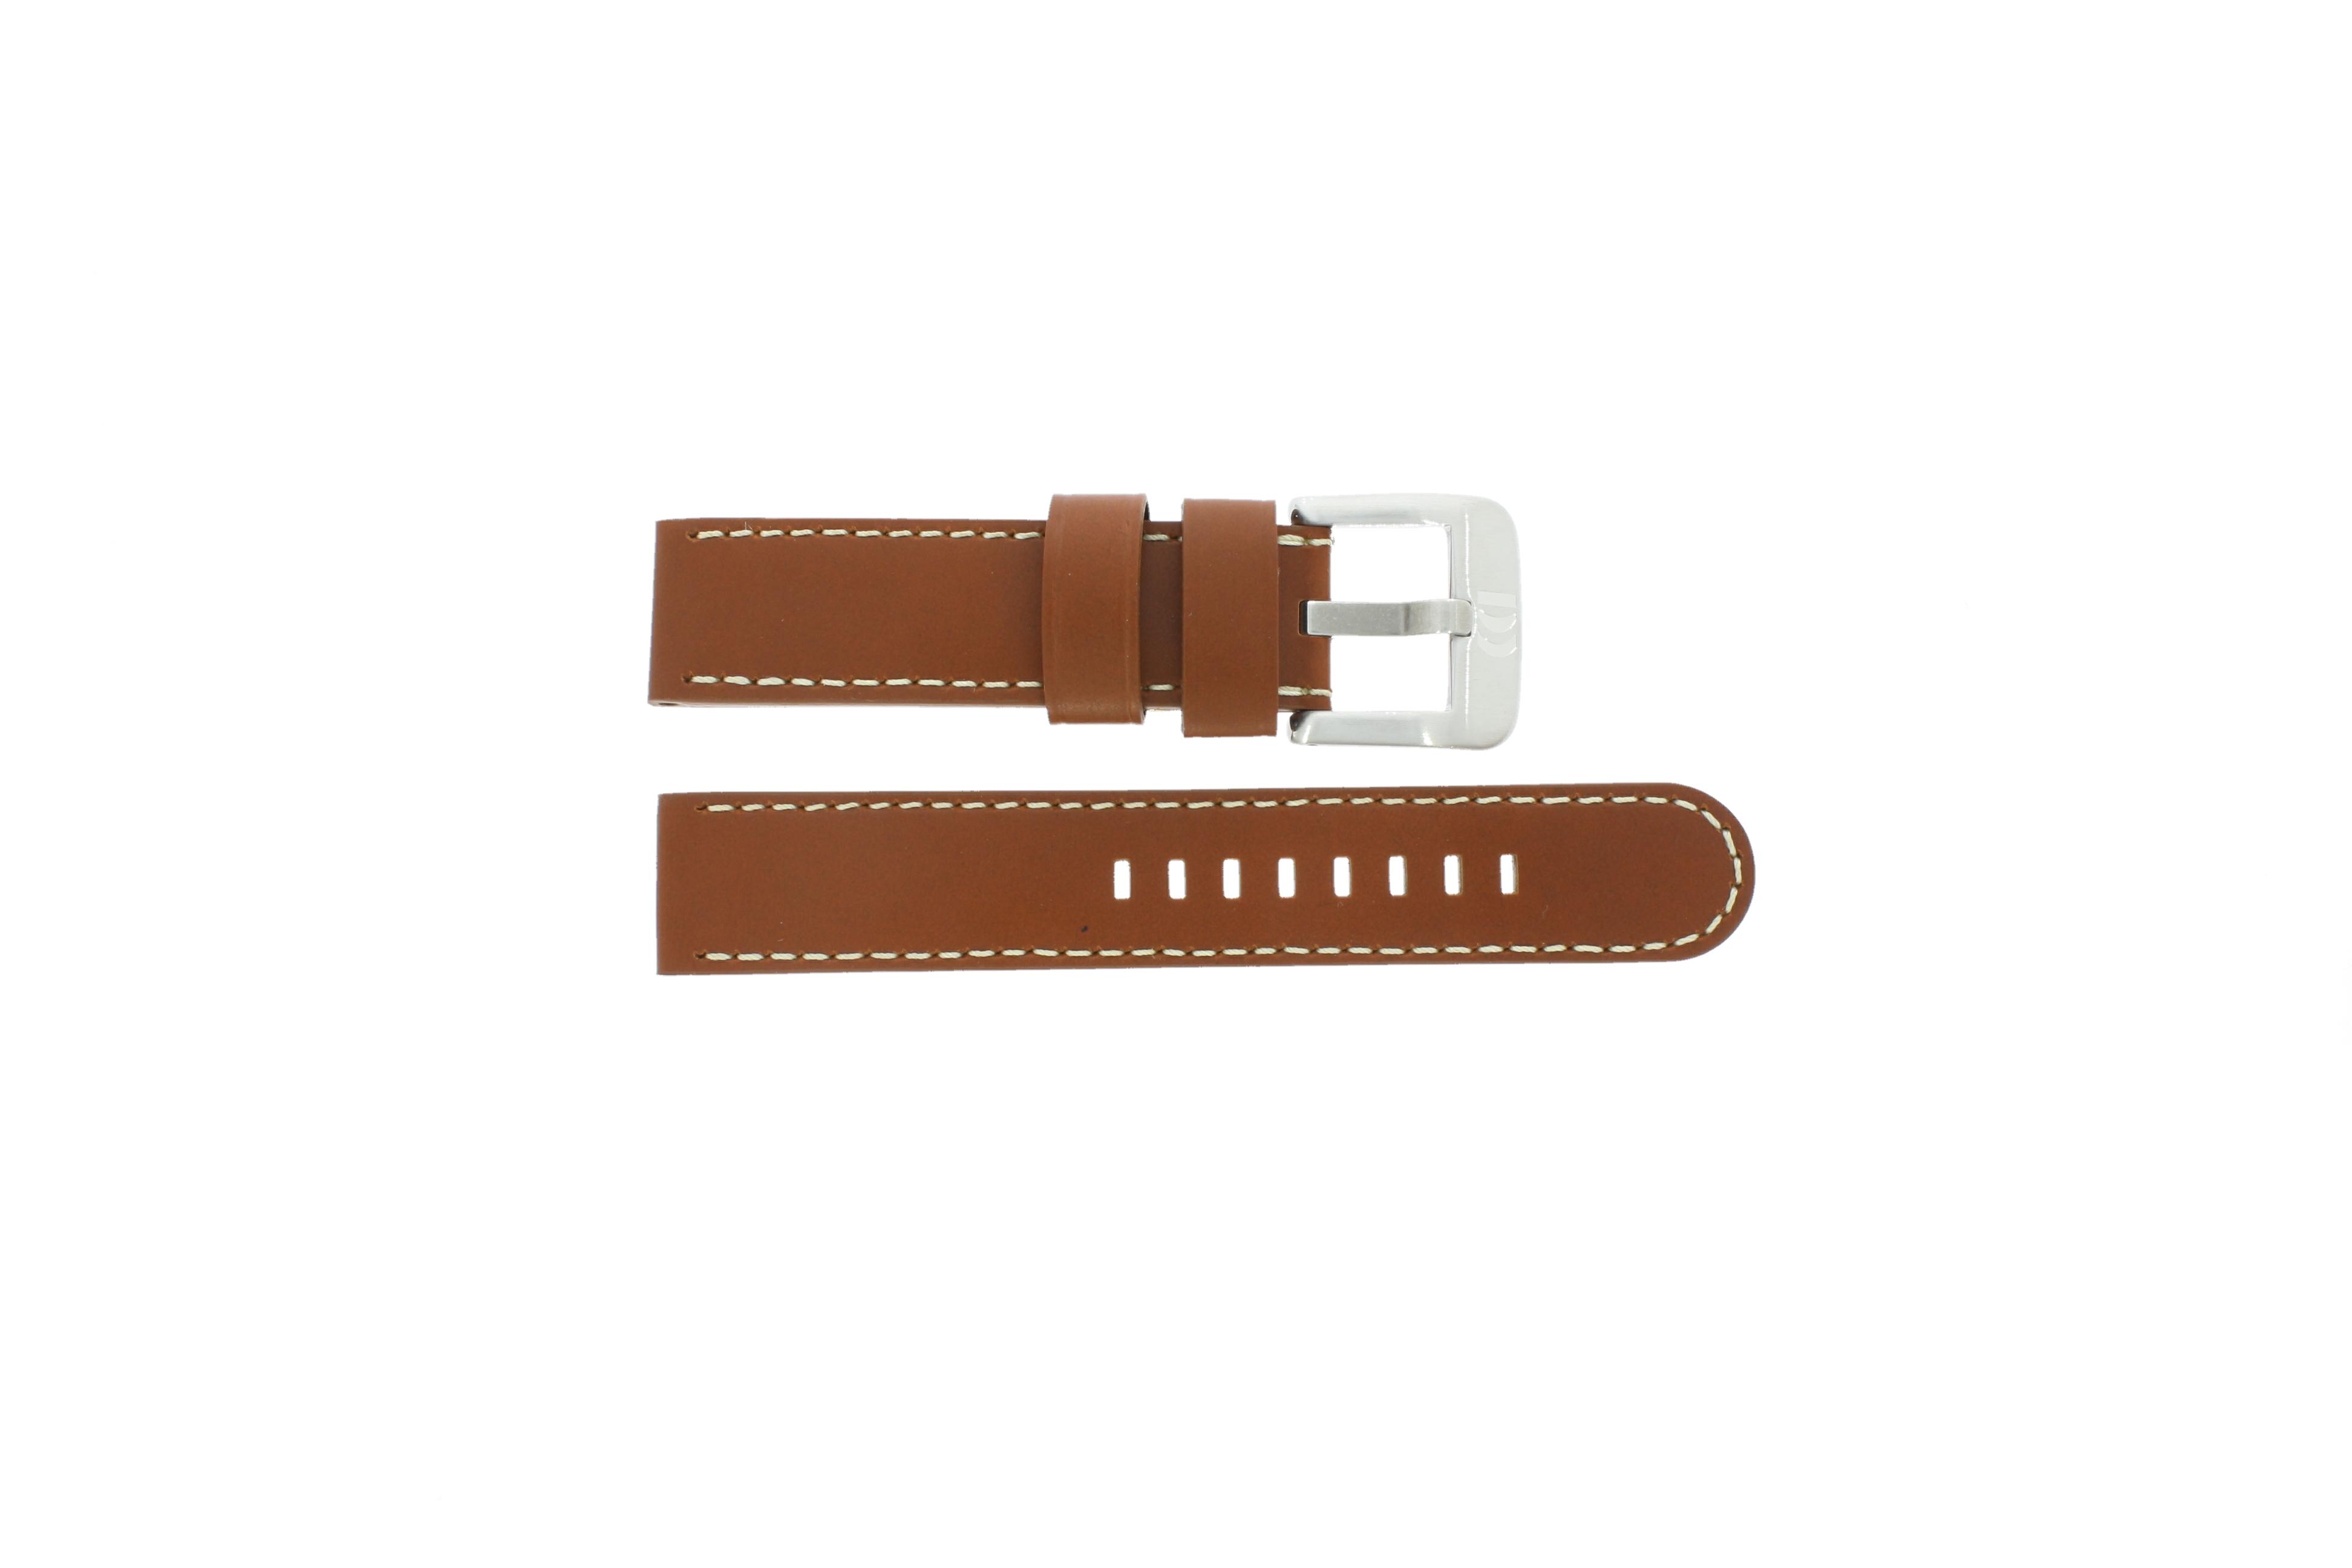 Danish Design klockarmband IQ12Q915 Läder Brun 20mm